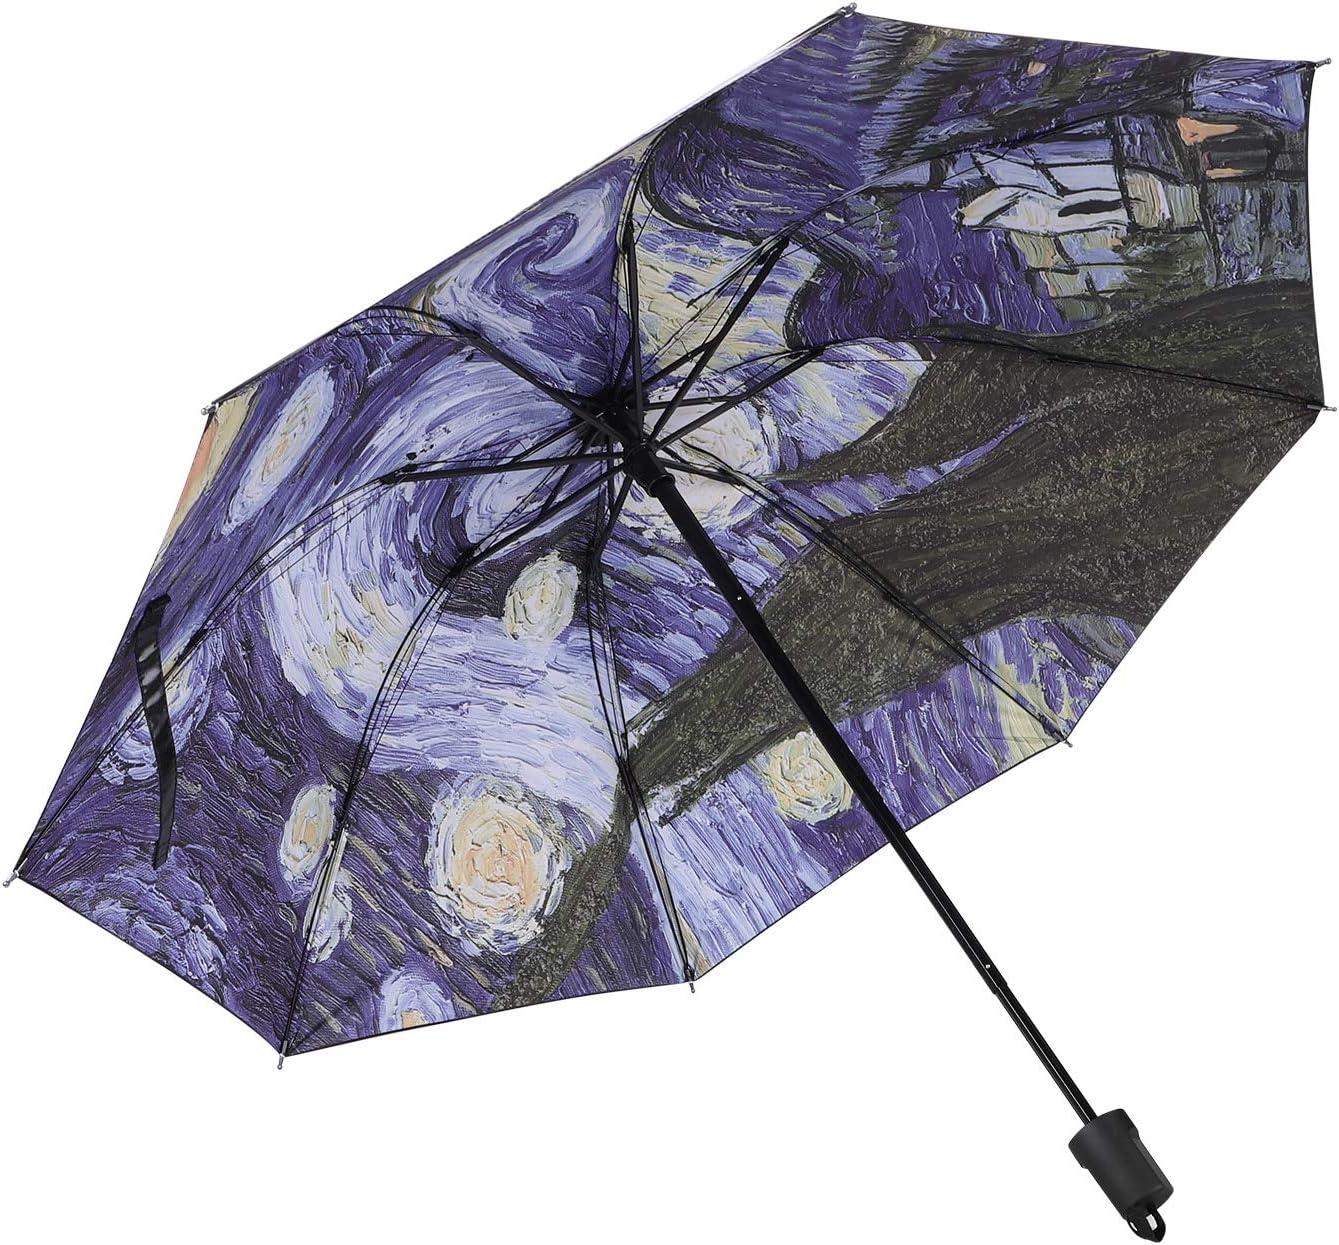 Windproof Parasol Rain Umbrella,Anti-UV Foldable Portable Oil Painting Cooling Umbrella for Travel Beach Sun Umbrella,ITODA UPF 50